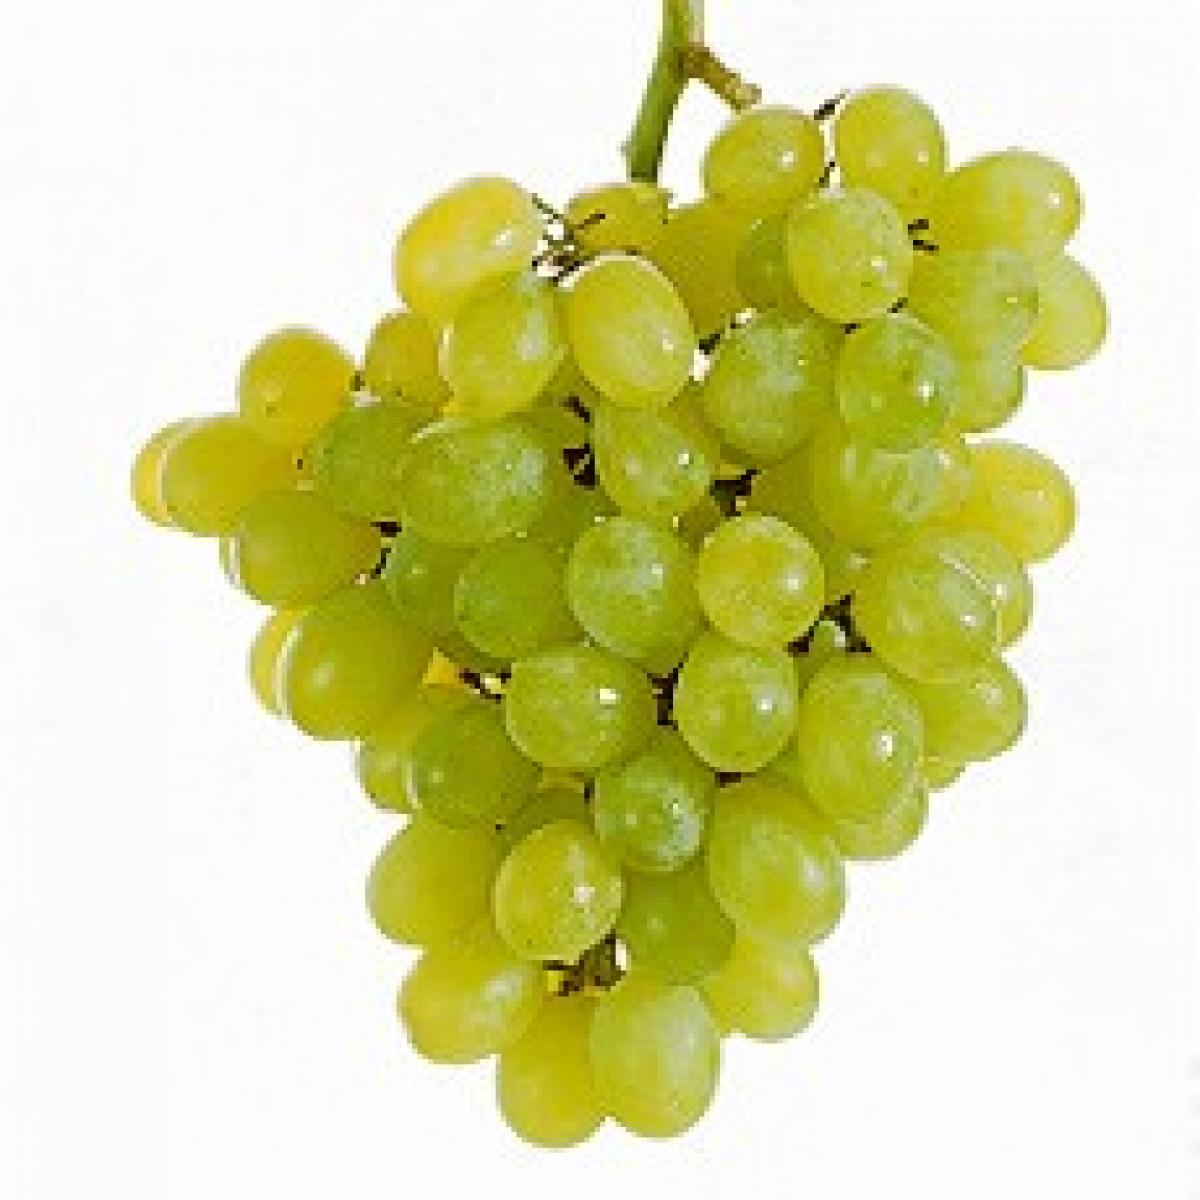 Grapes 19476